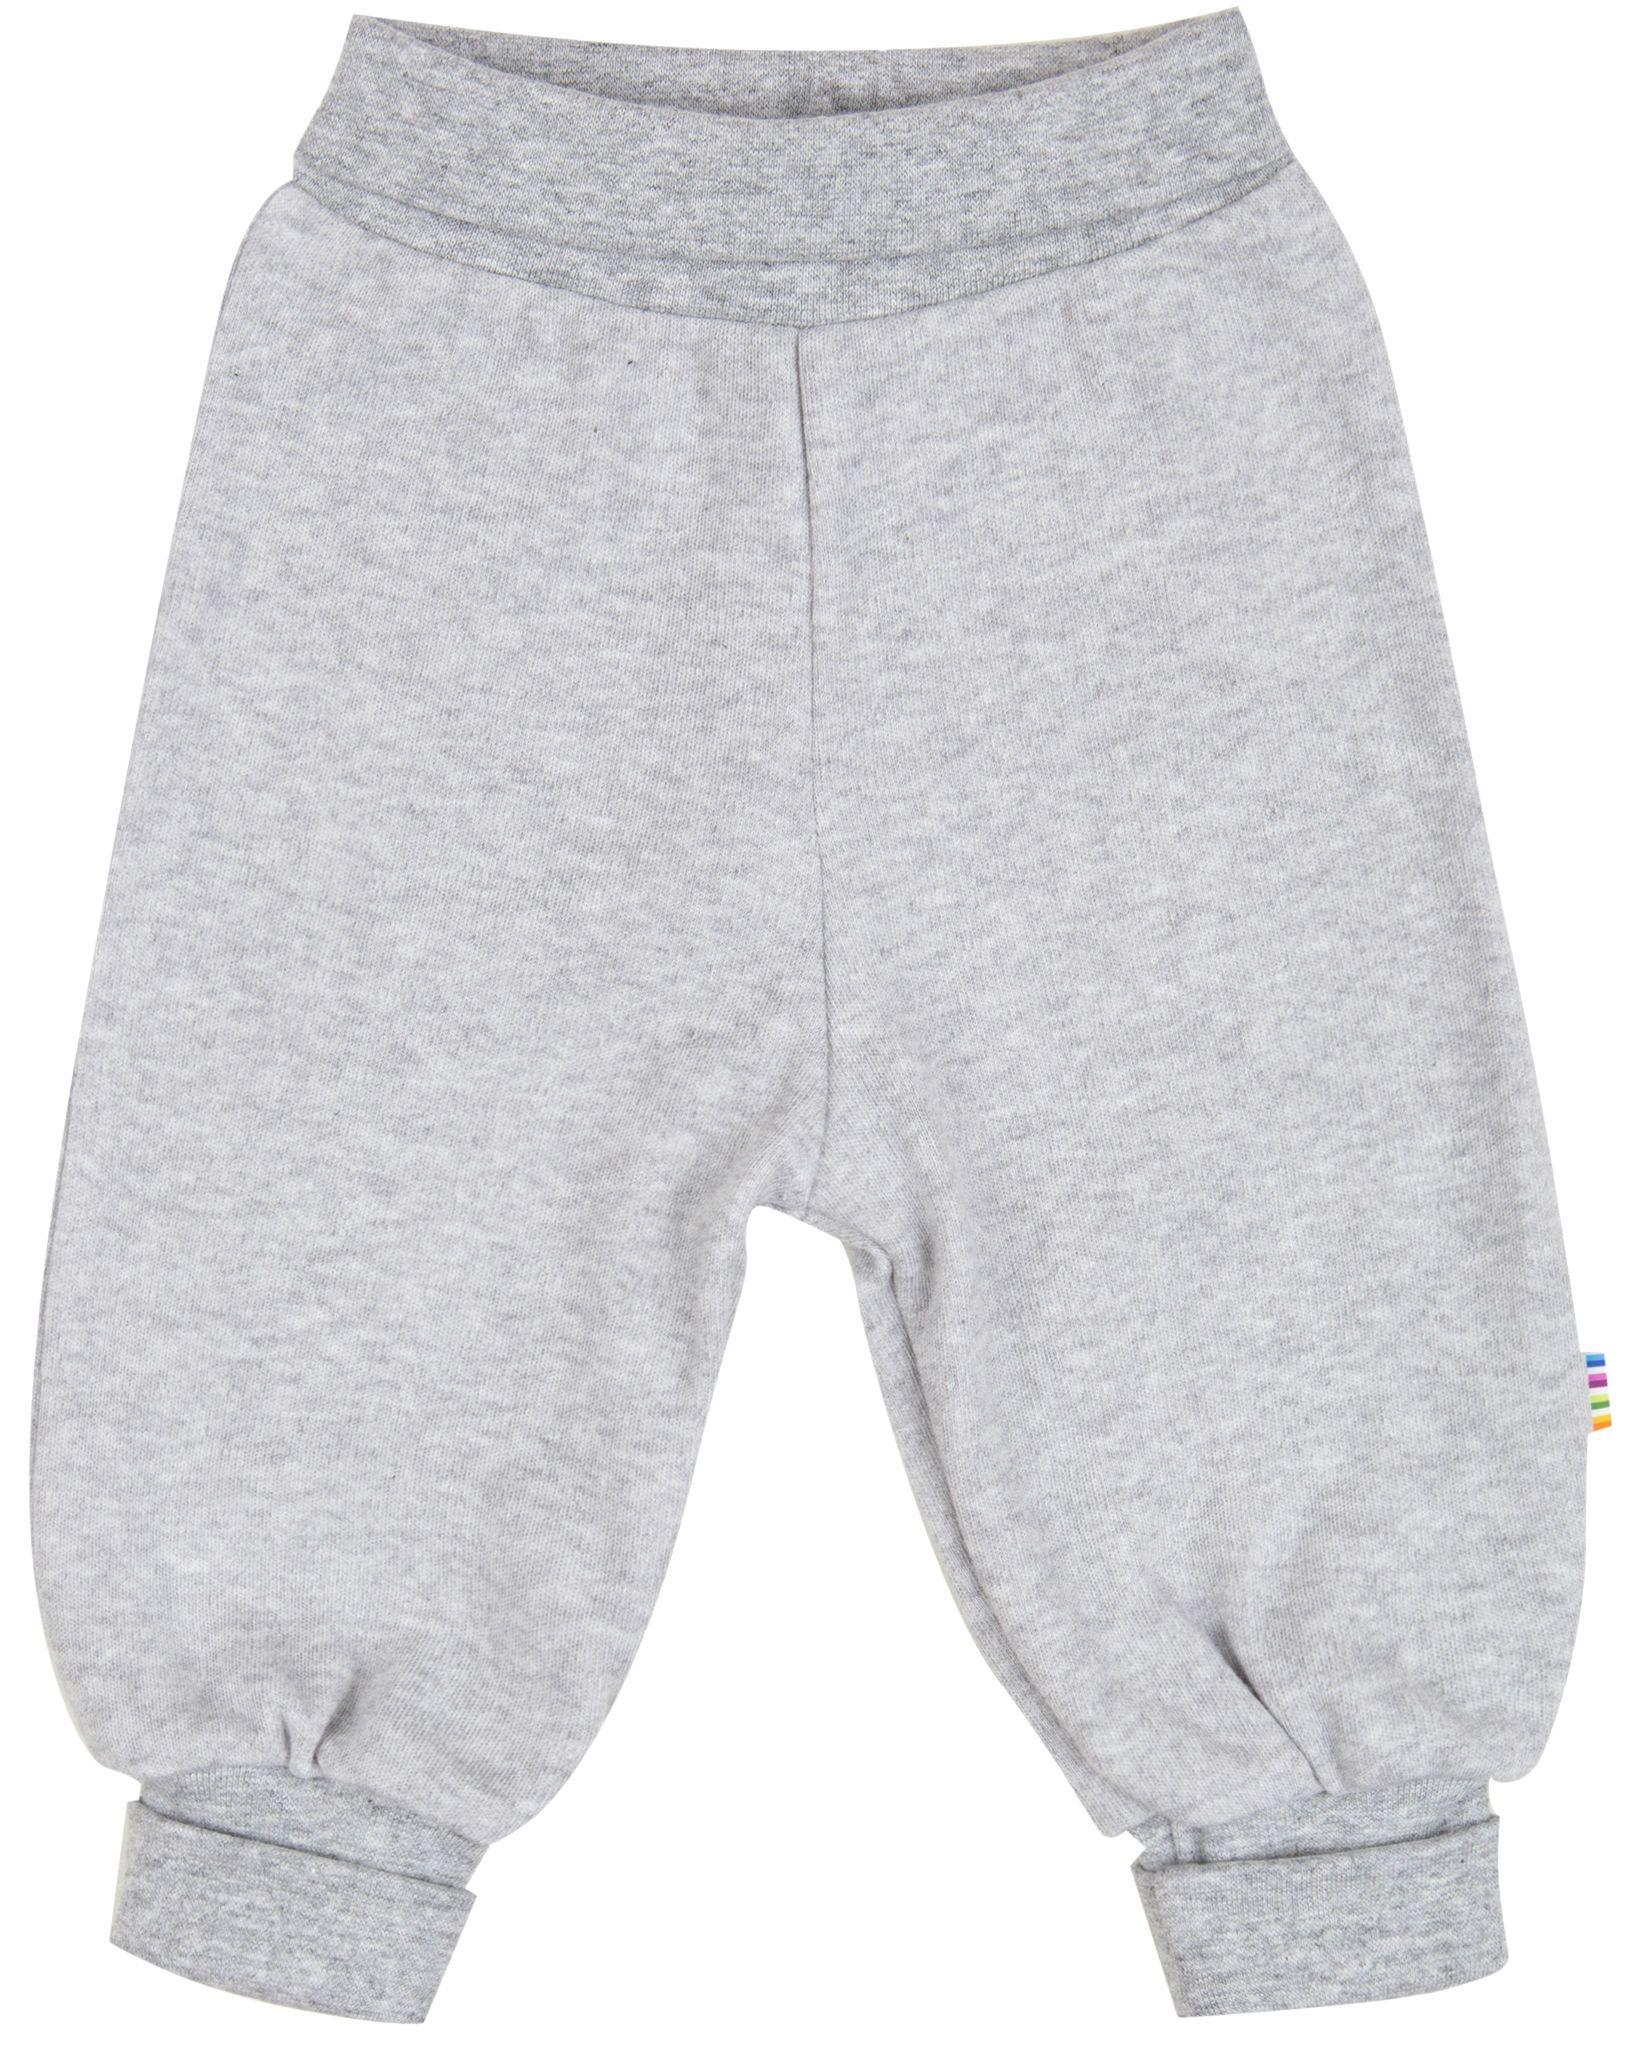 Image of Sweat Pants fra Joha - Light Grey Melange (20610-28-15340)